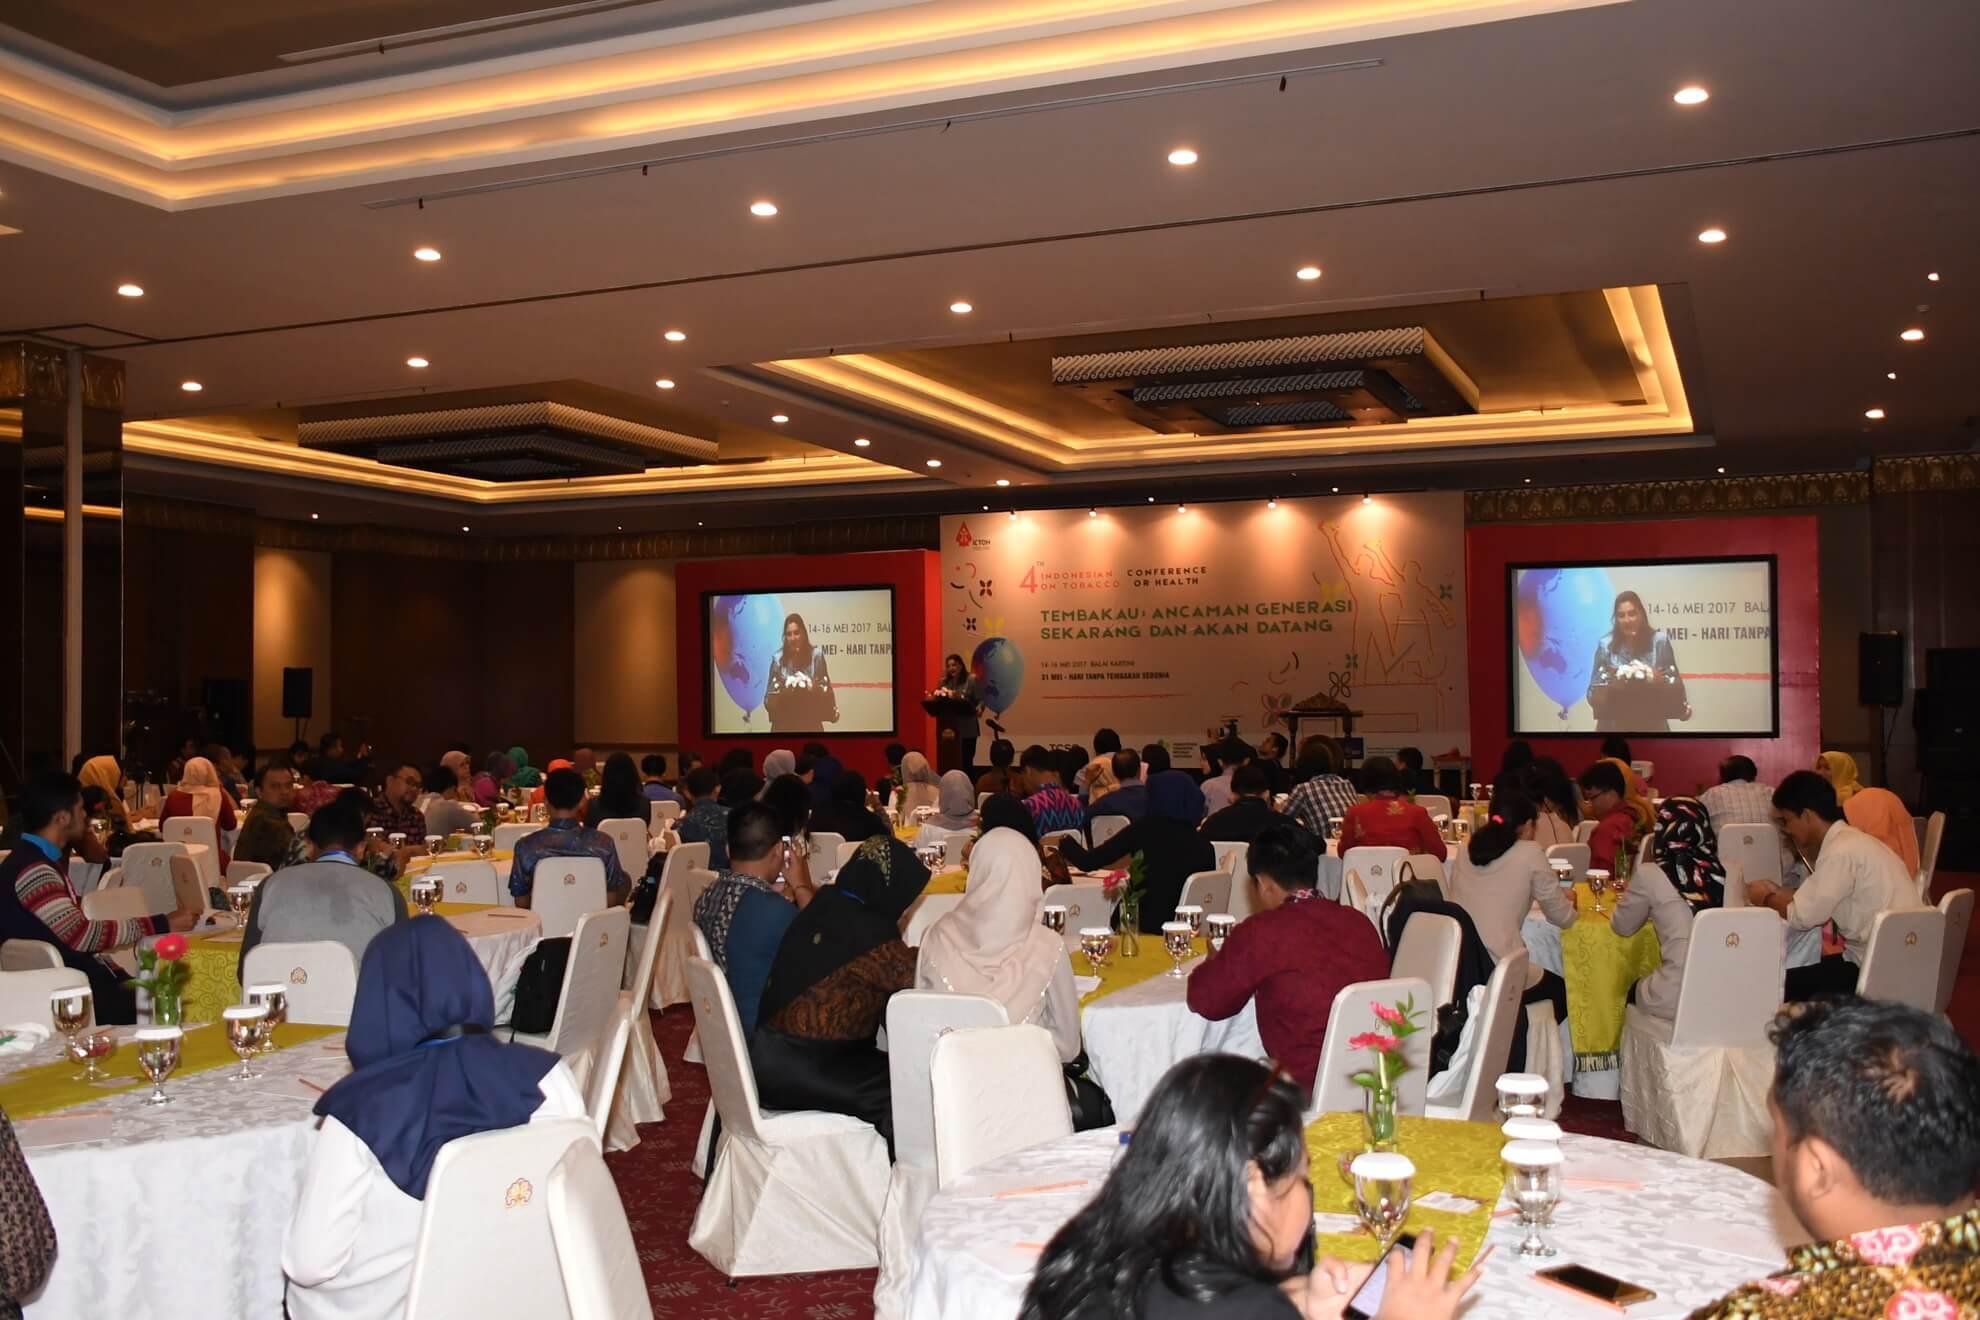 15-5-2017-sambutan-who-representative-dr-jihane-tawilah-pada-the-4th-indonesian-conference-on-tobacco-or-health-ictoh-2017